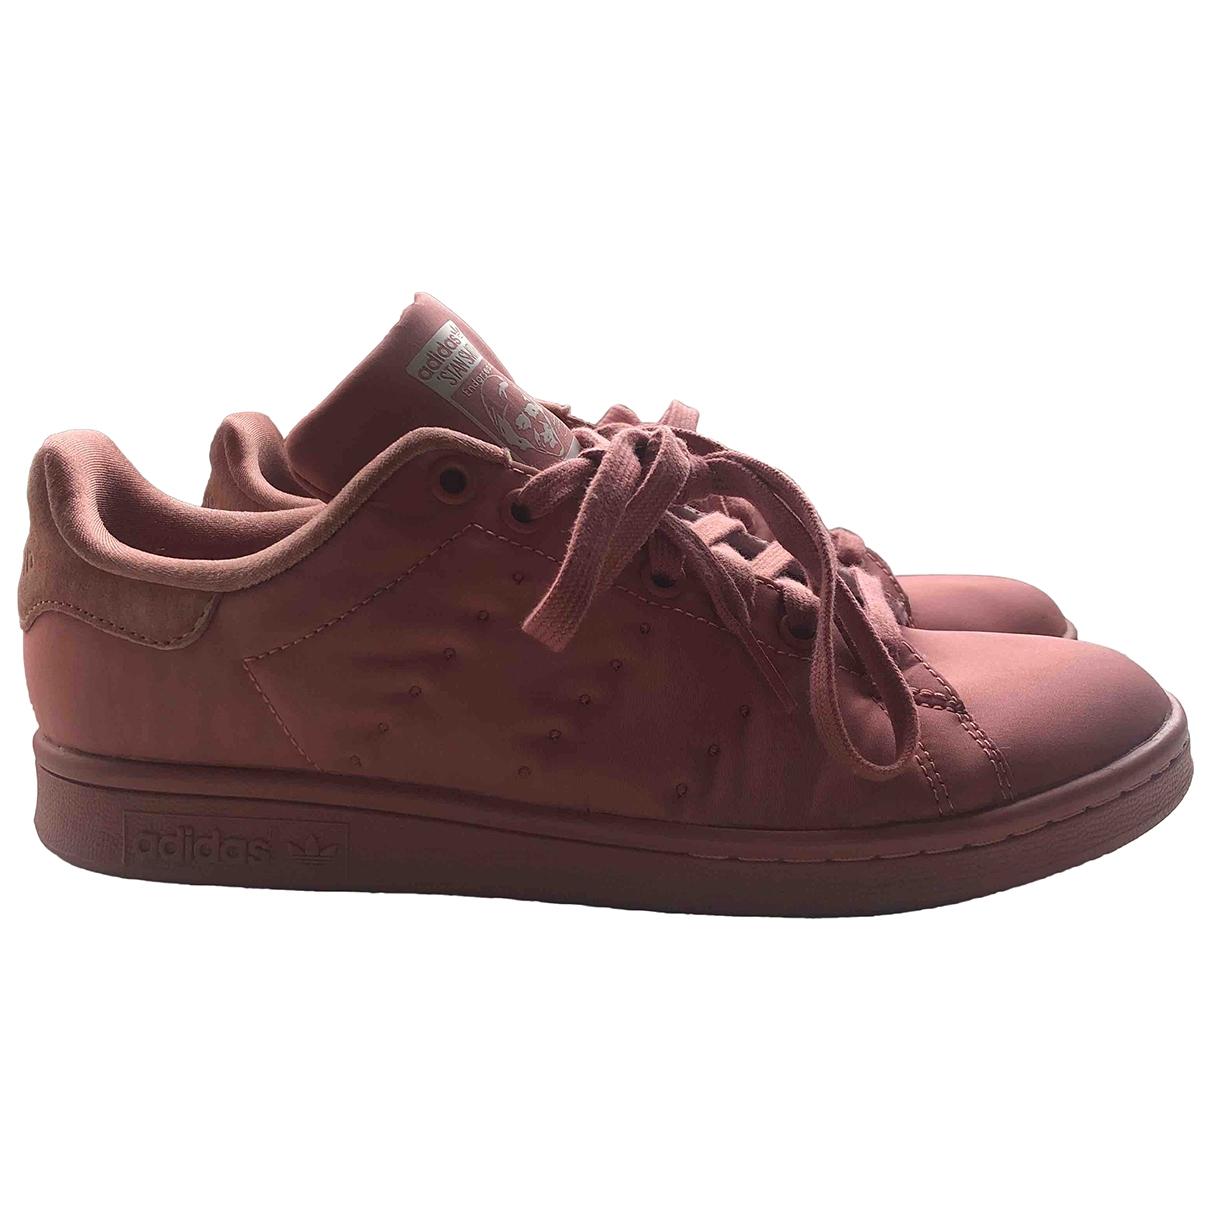 Adidas - Baskets Stan Smith pour femme en toile - rose